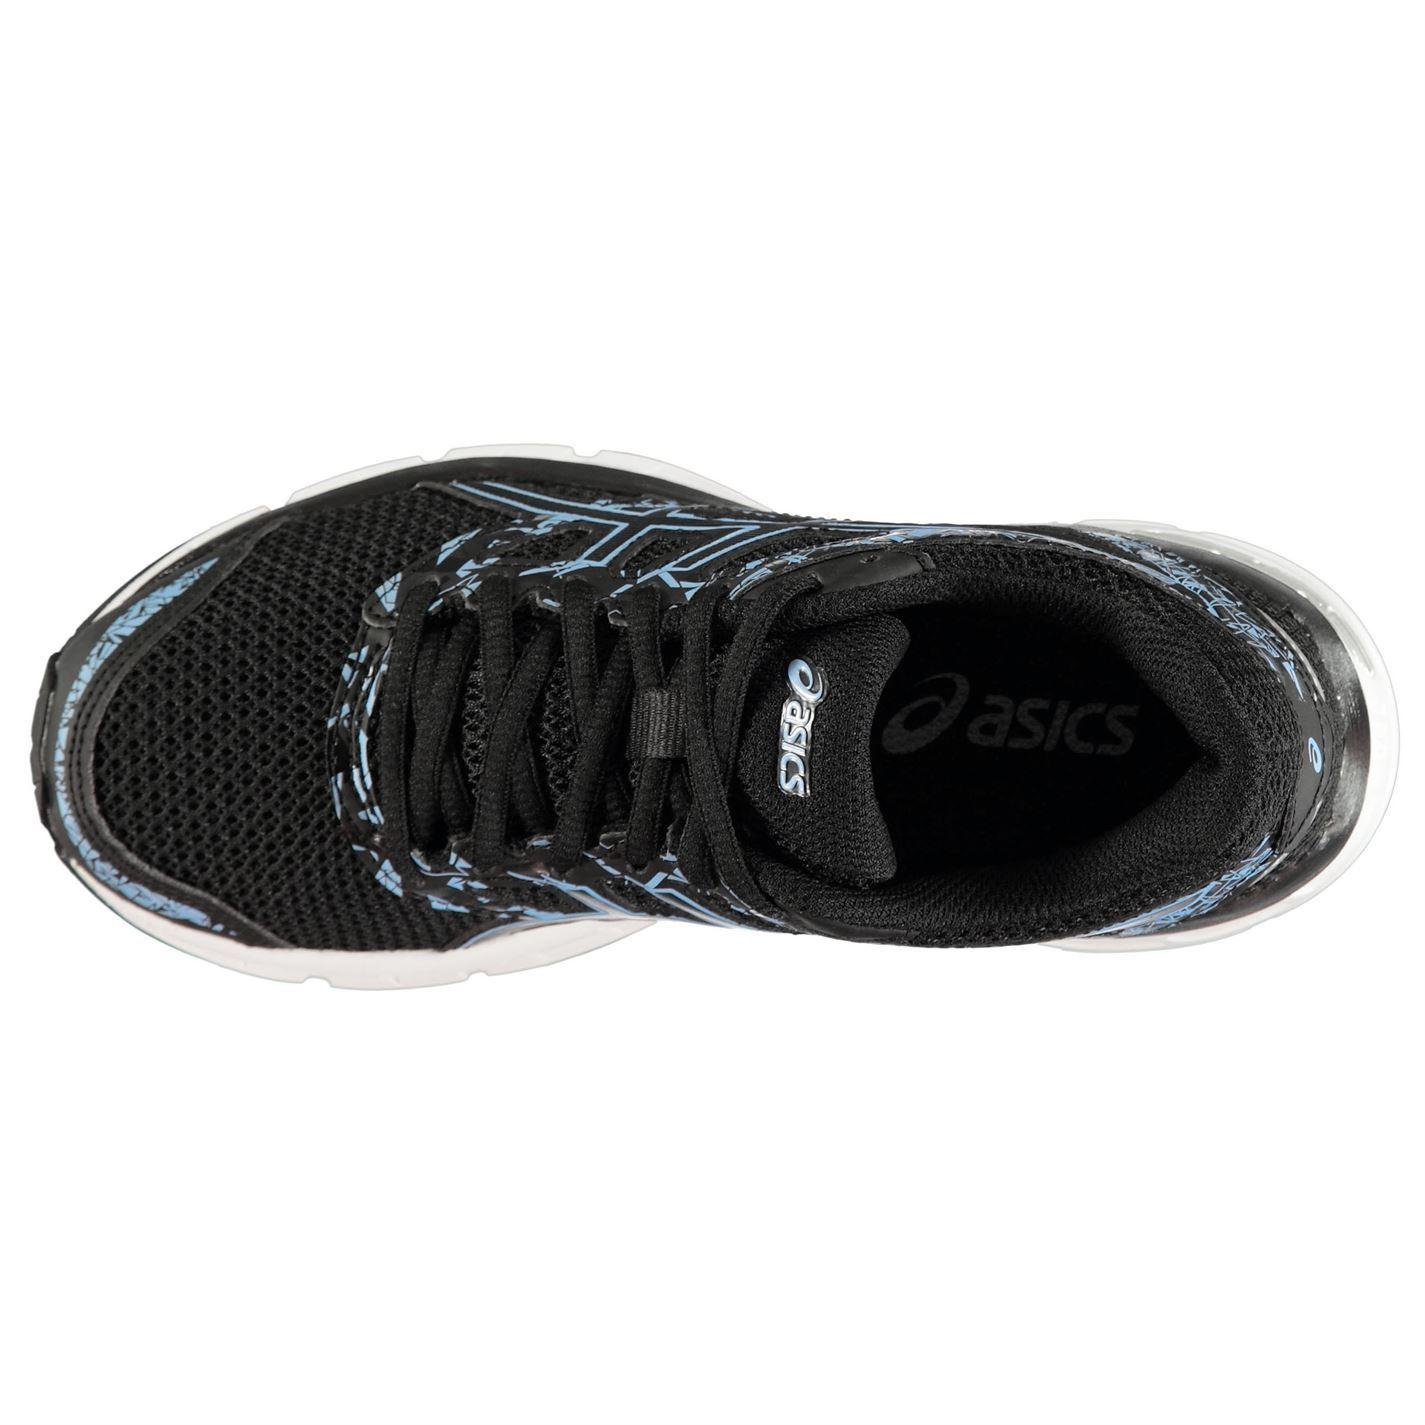 Detalles de Asics Gel Excite 4 Zapatillas Running Mujer Negro/Azul  Deportivas